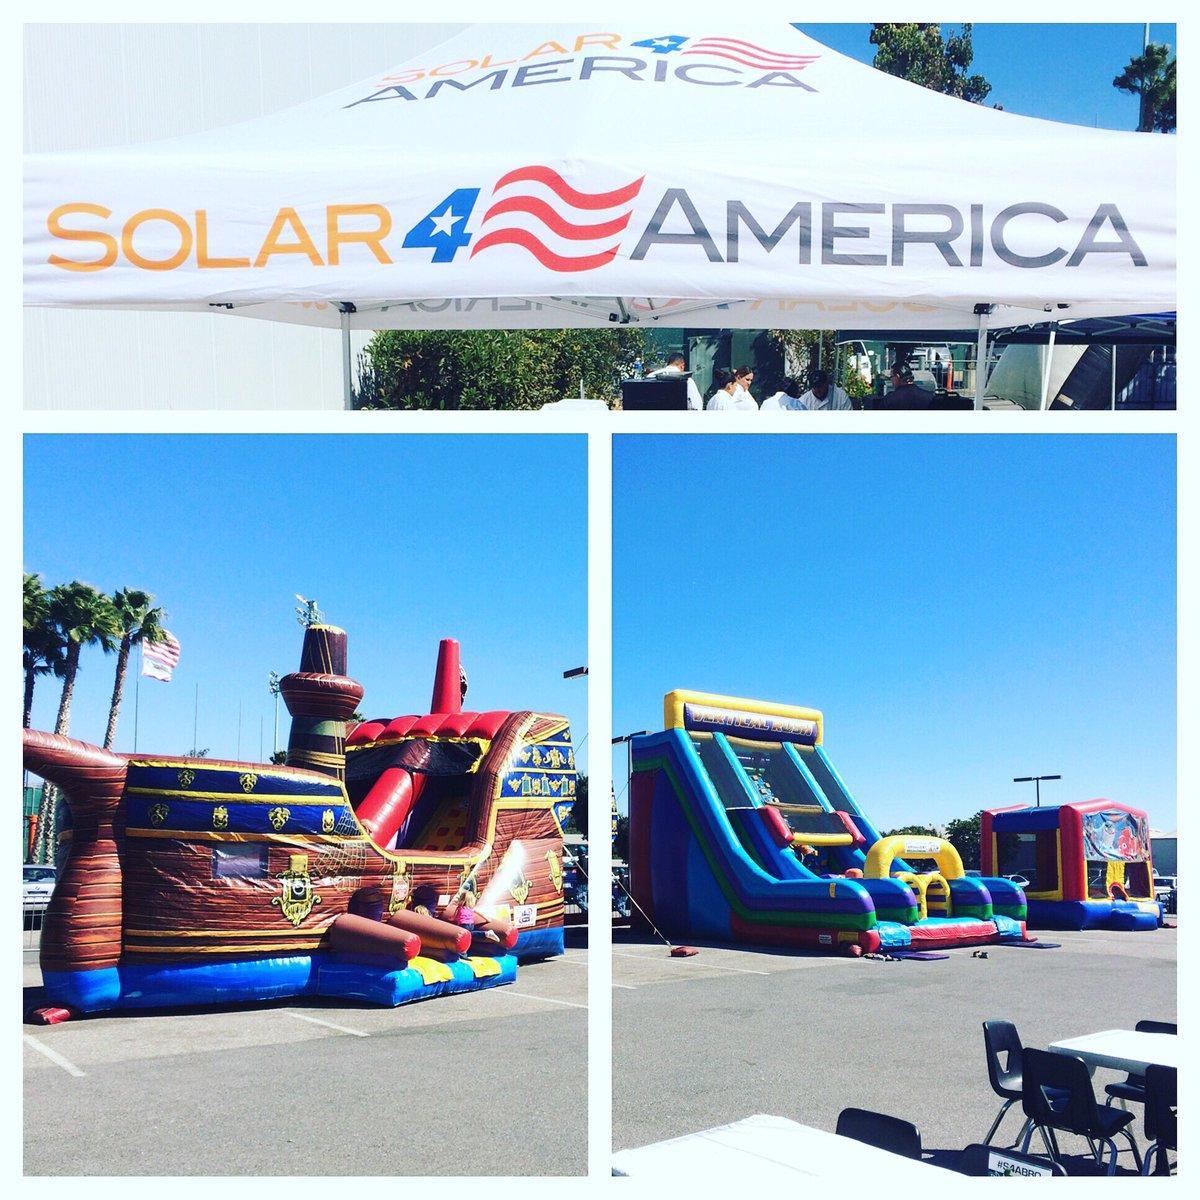 Solar For America >> Solar4america Ice On Twitter Solar 4 America Getting Ready For